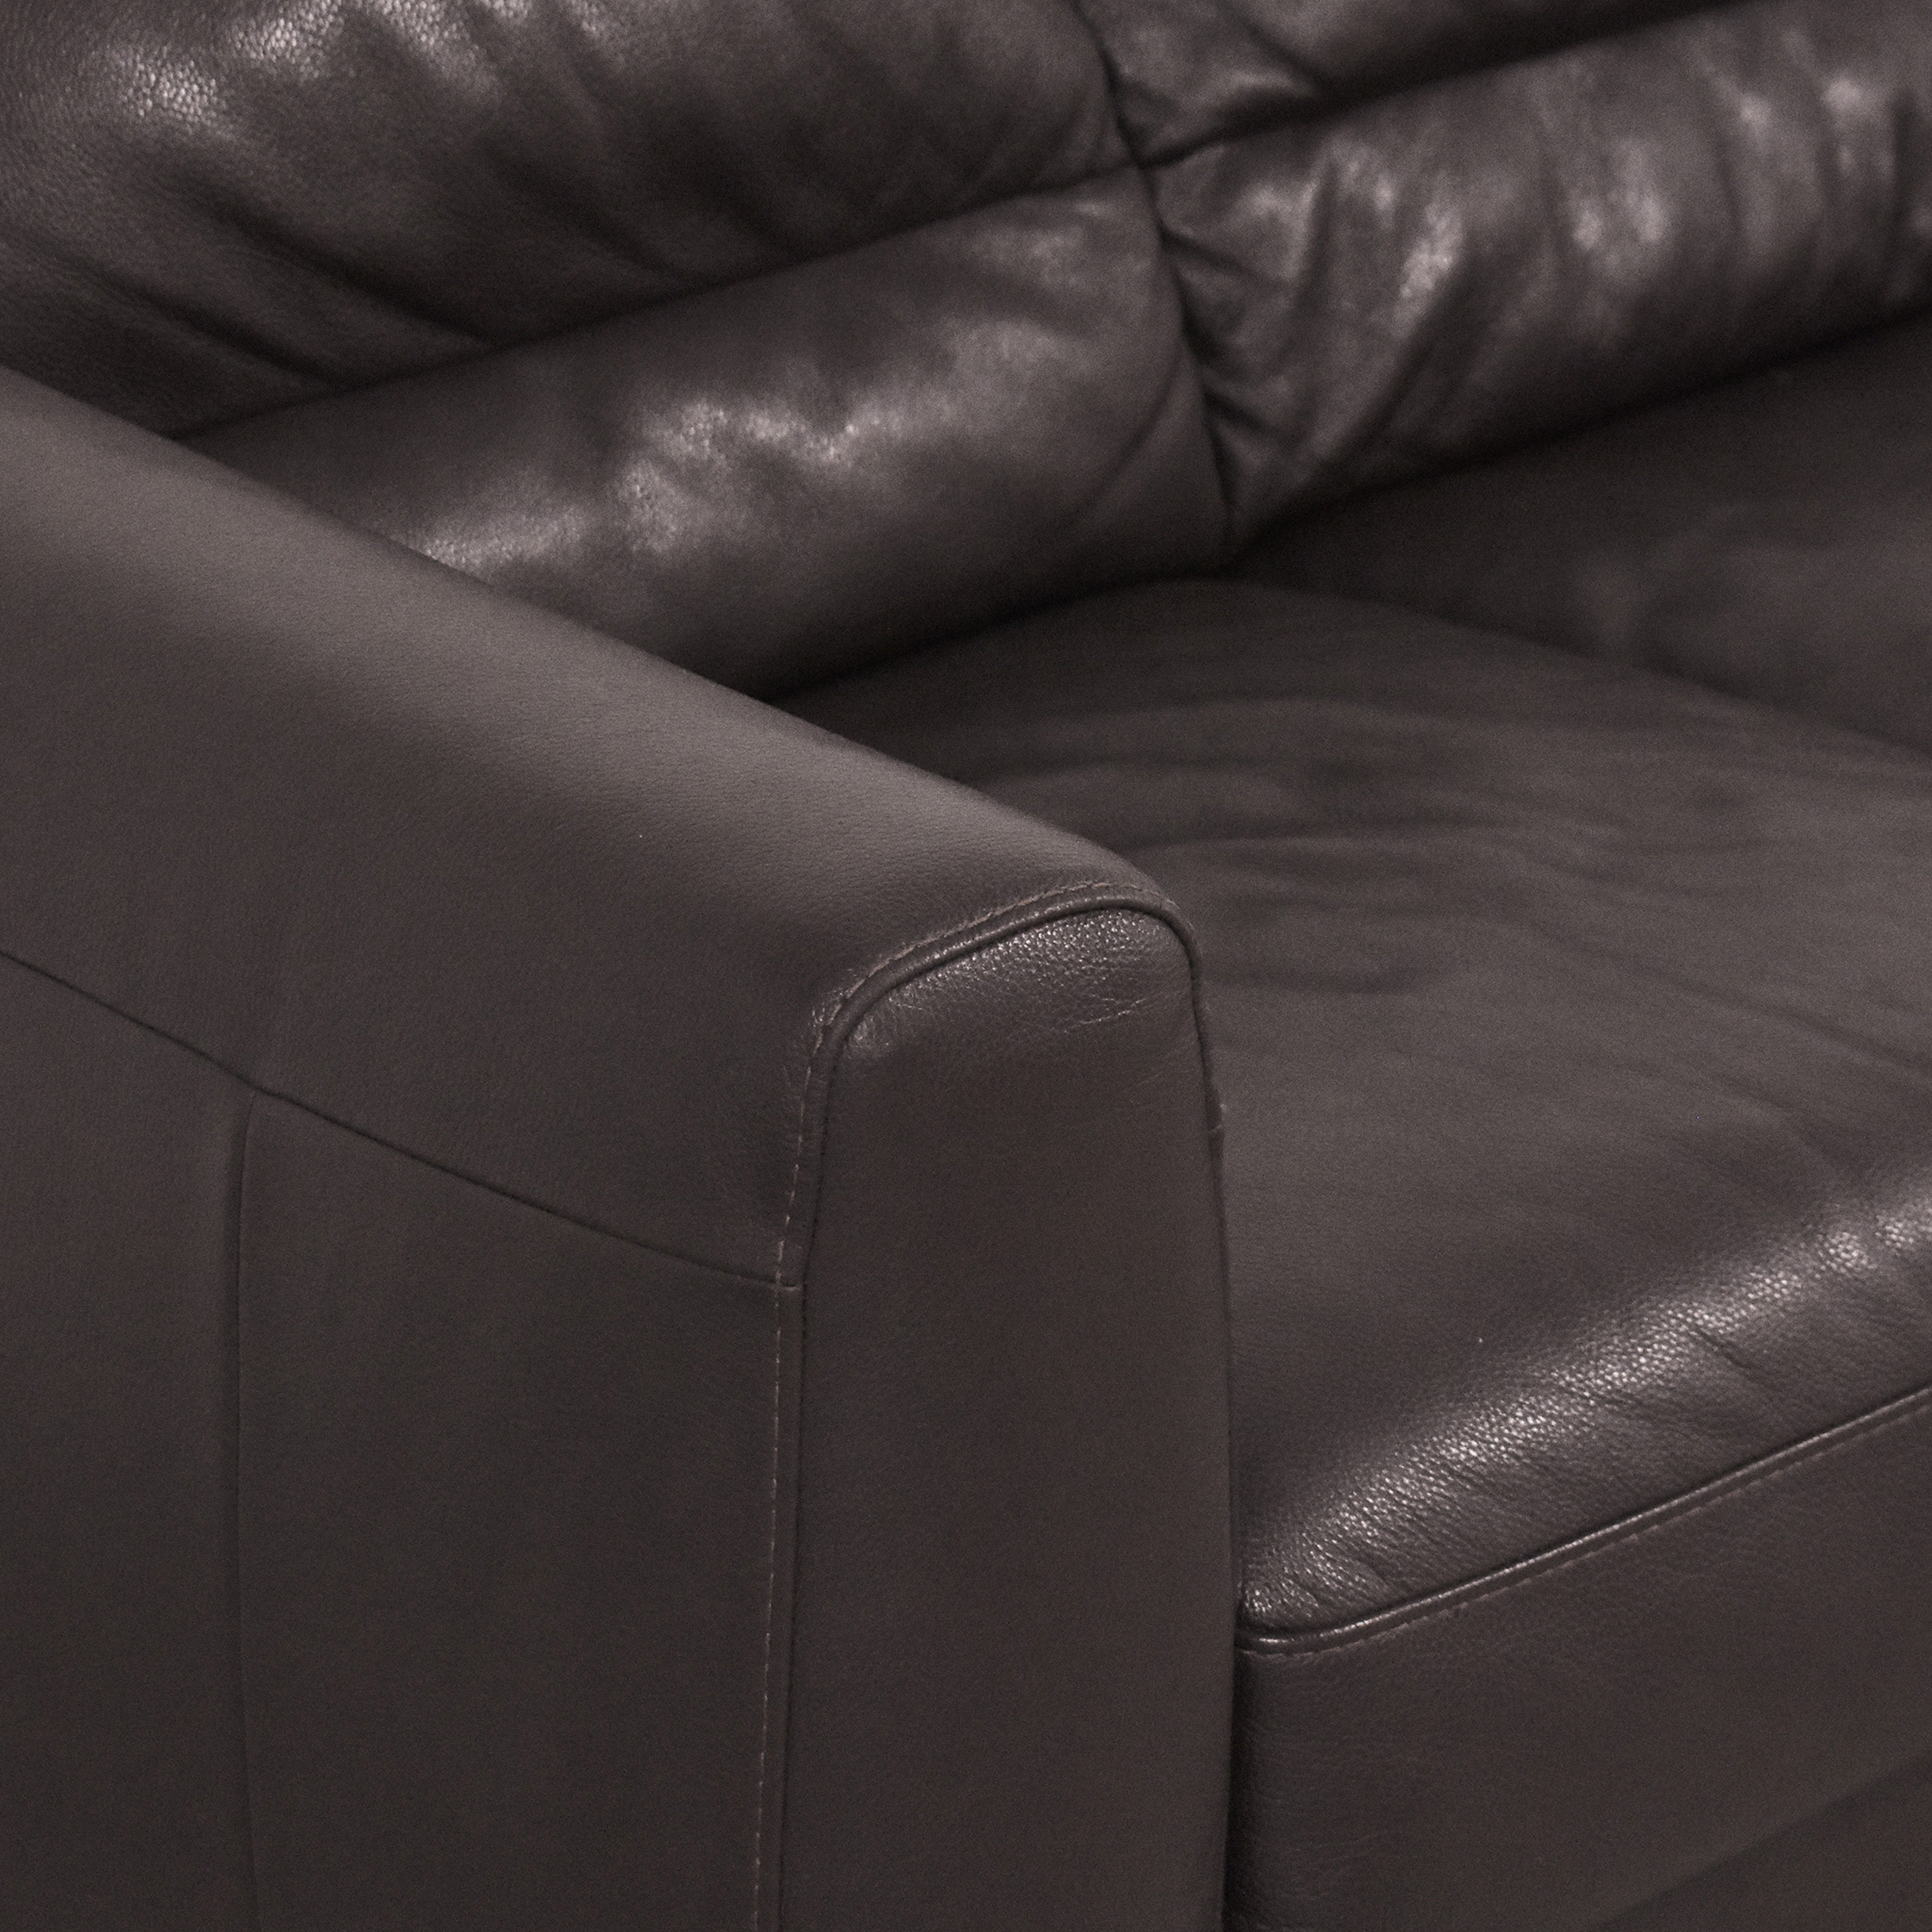 Natuzzi Natuzzi Three Cushion Sofa dimensions